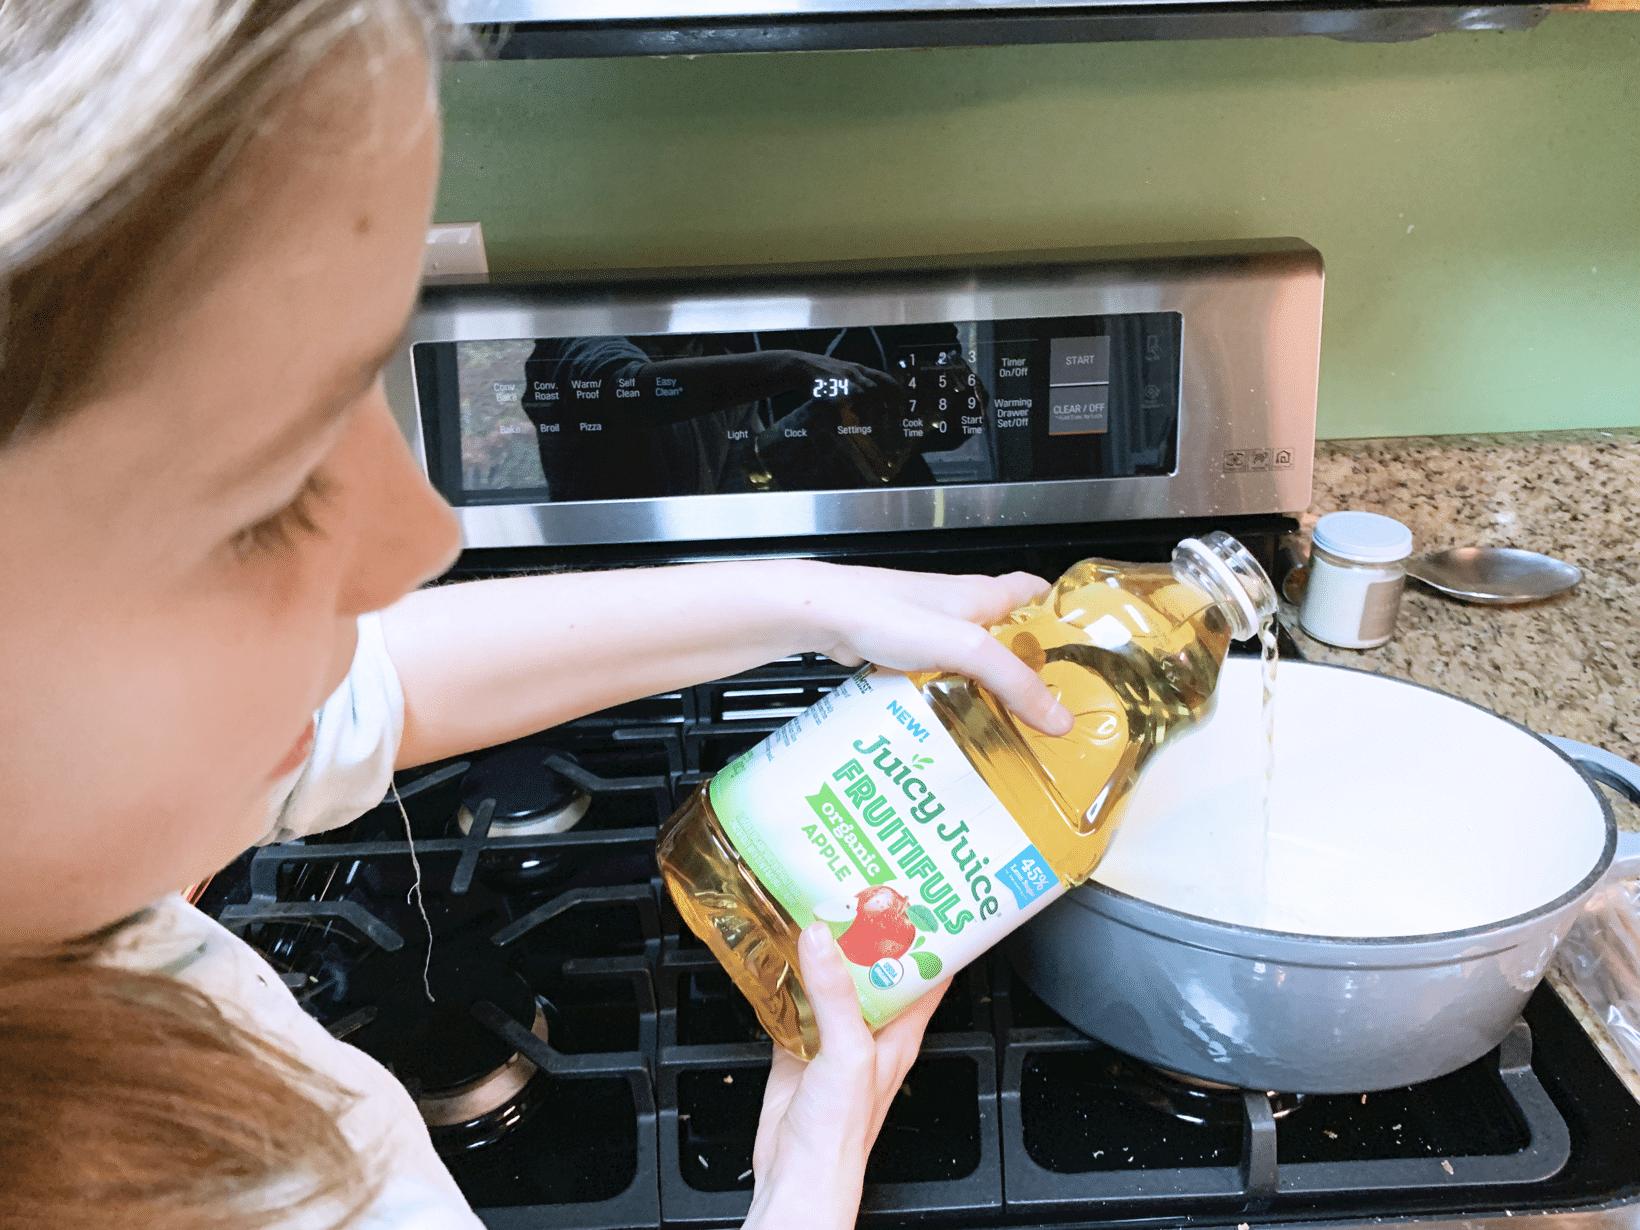 Pouring juicy juice